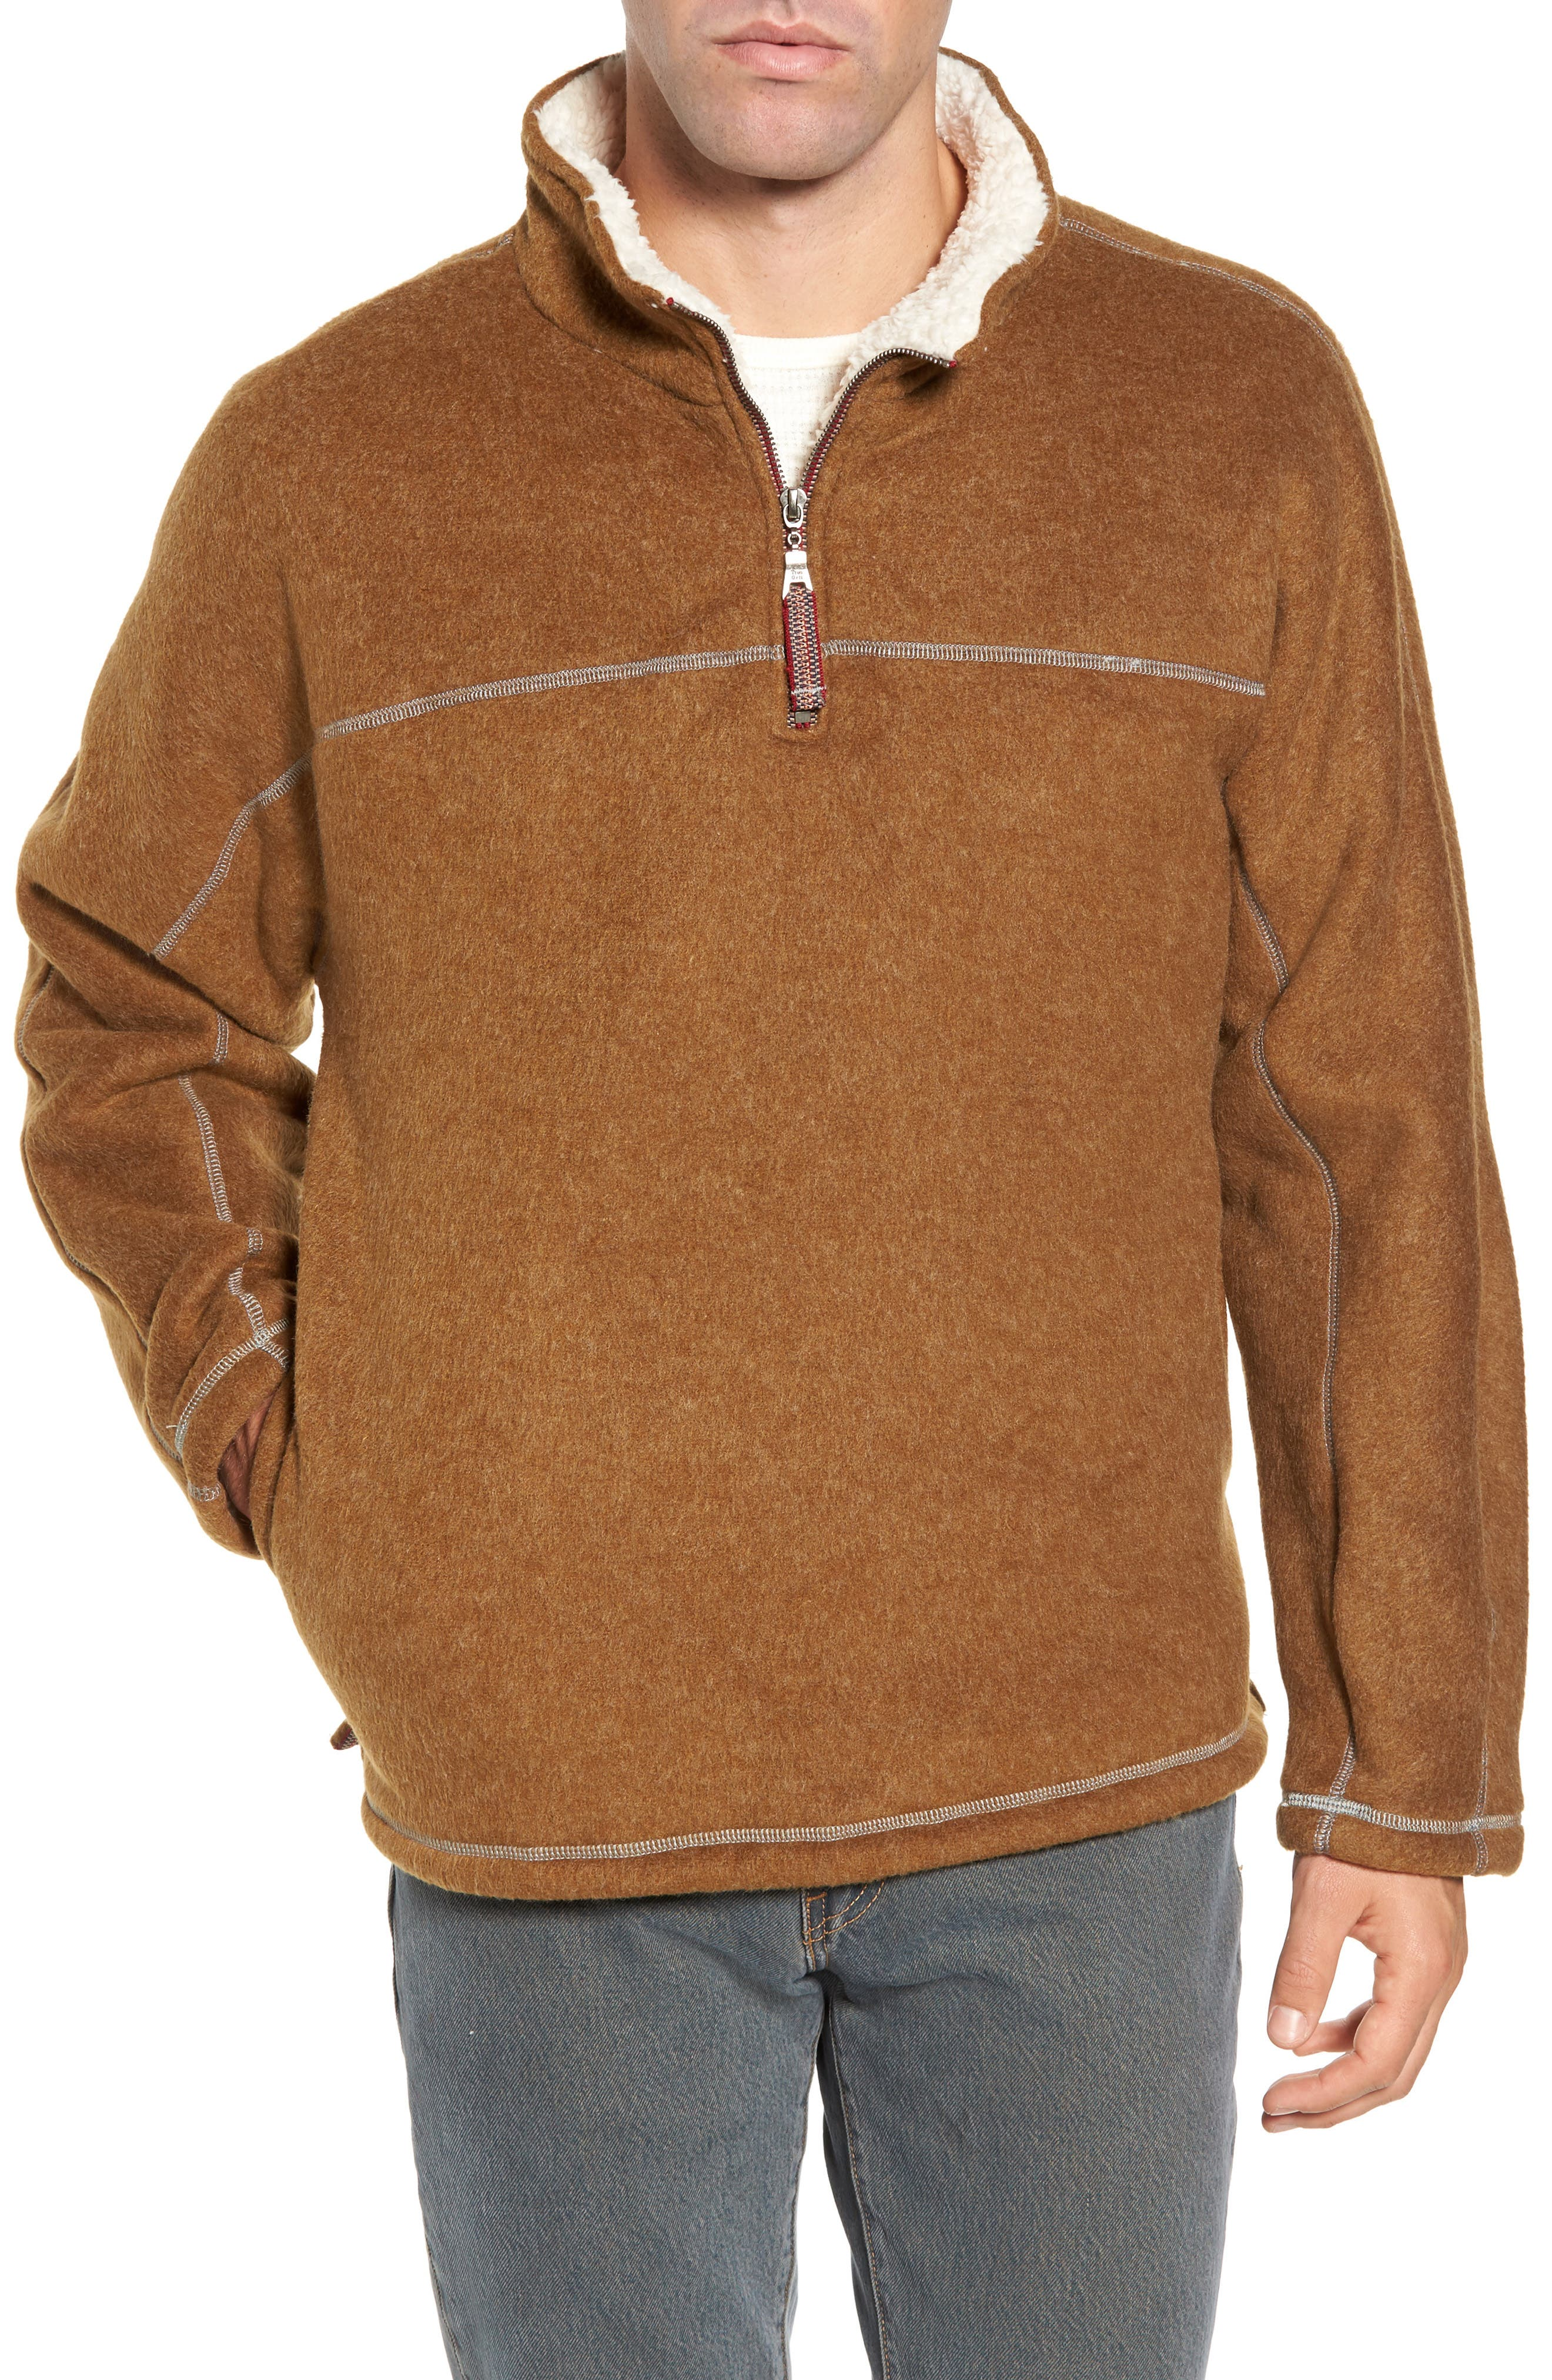 True Grit Faux Fur Lined Fleece Quarter Zip Pullover